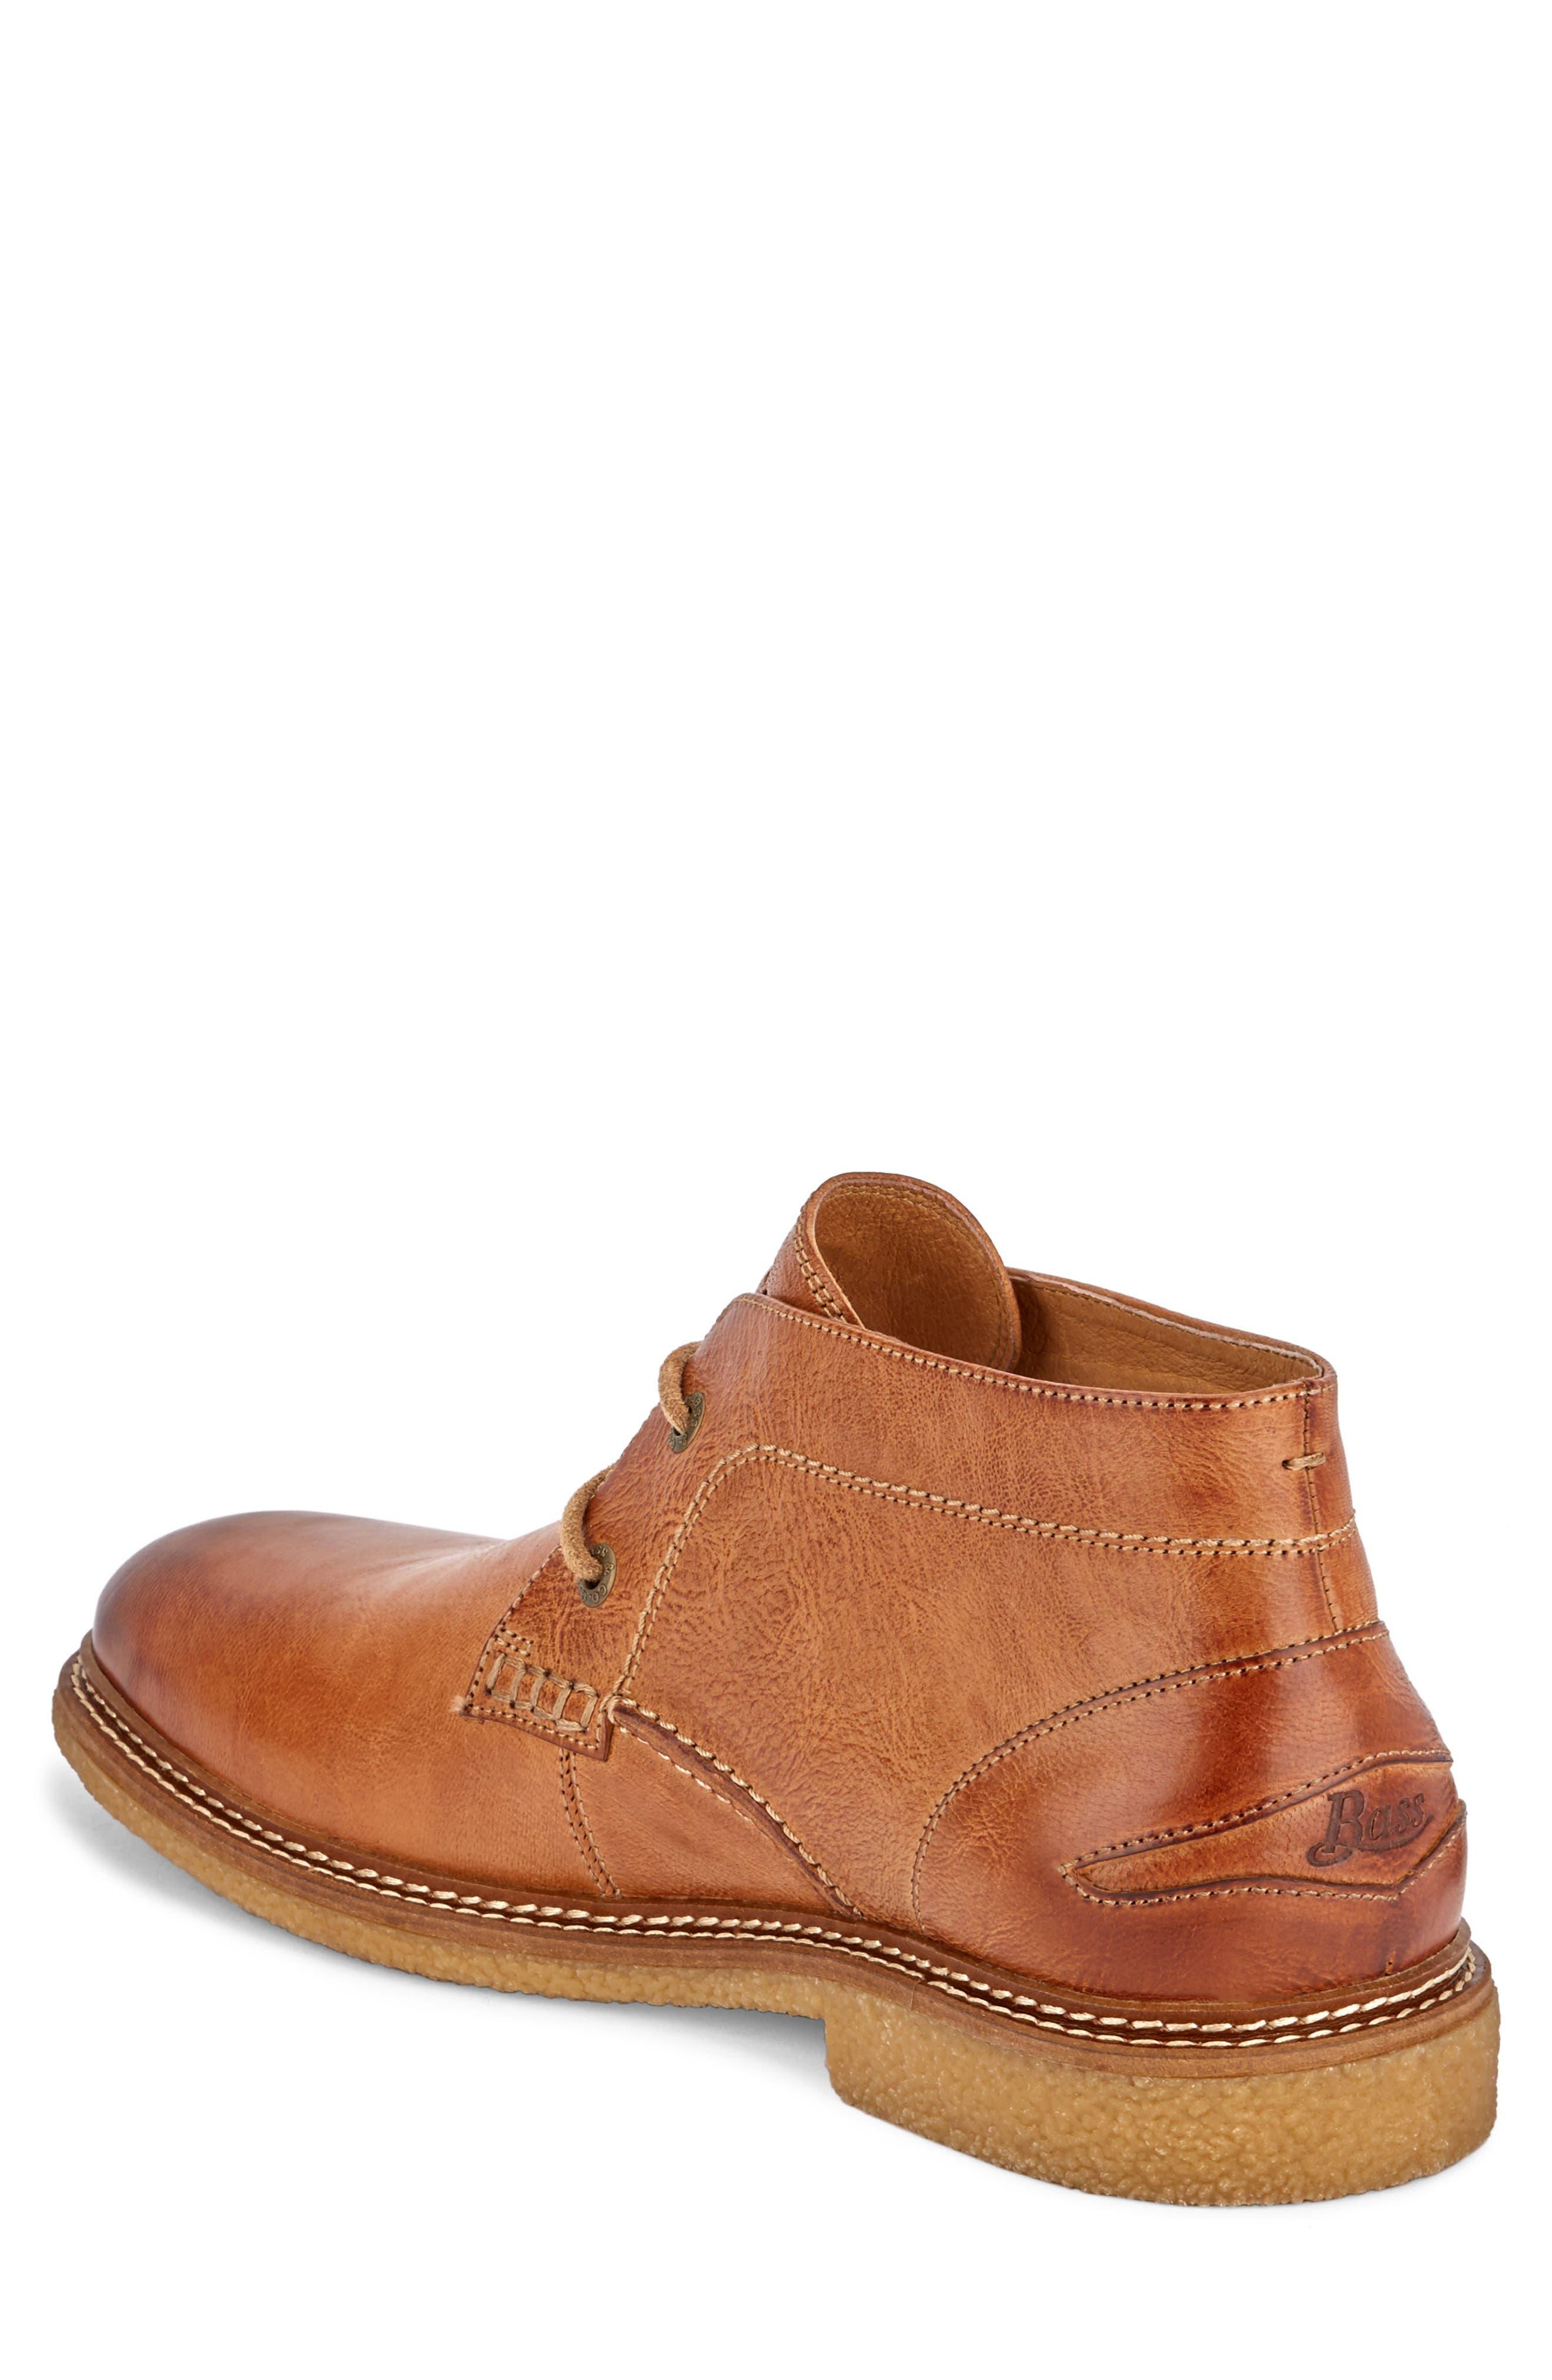 'Bennett' Chukka Boot,                             Alternate thumbnail 2, color,                             Tan Leather